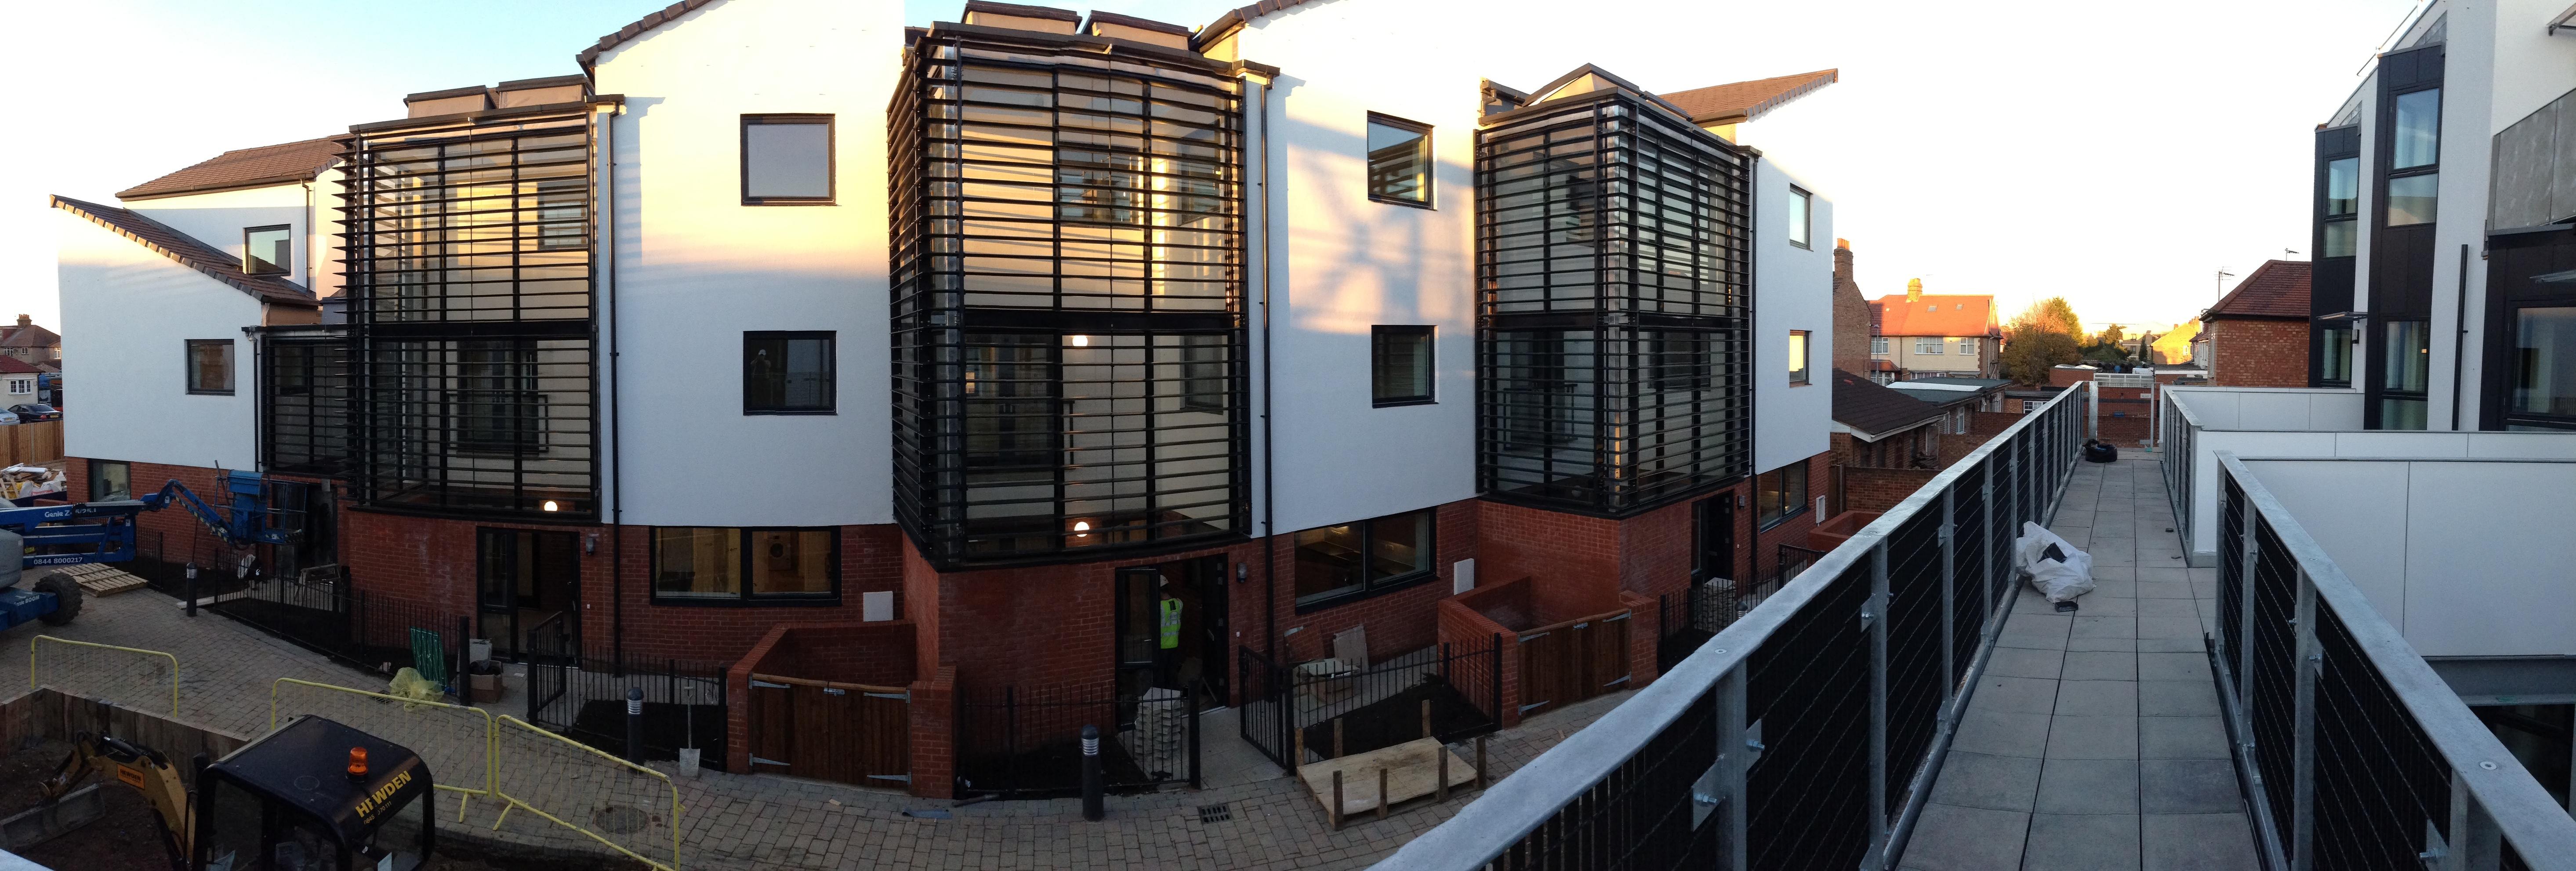 Modern Apartment Block Solare Shading